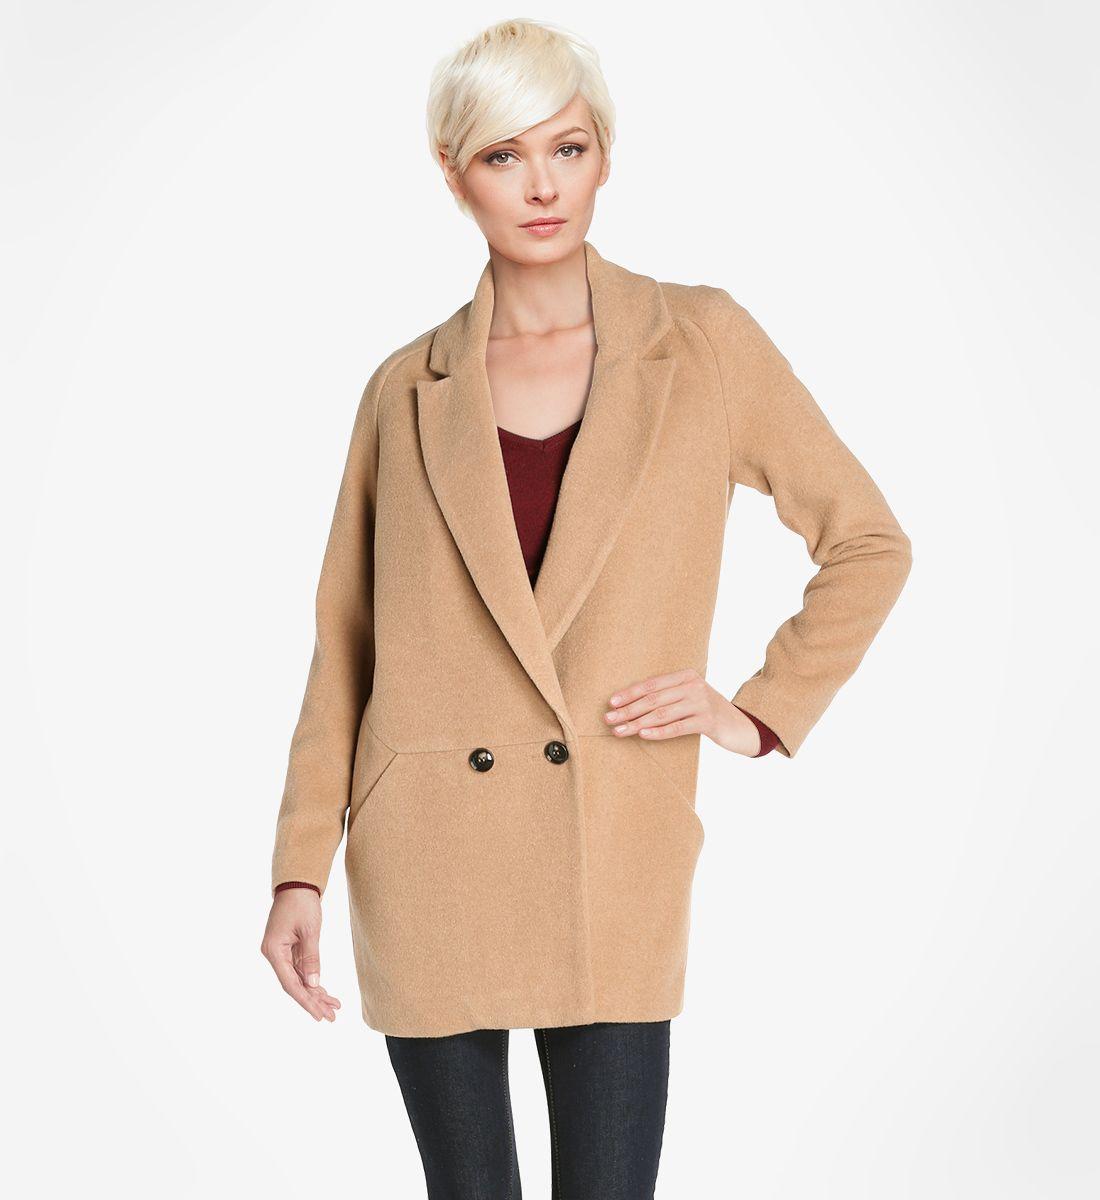 manteau masculin see u soon en camel pour femme galeries lafayette 130 manteaux pinterest. Black Bedroom Furniture Sets. Home Design Ideas